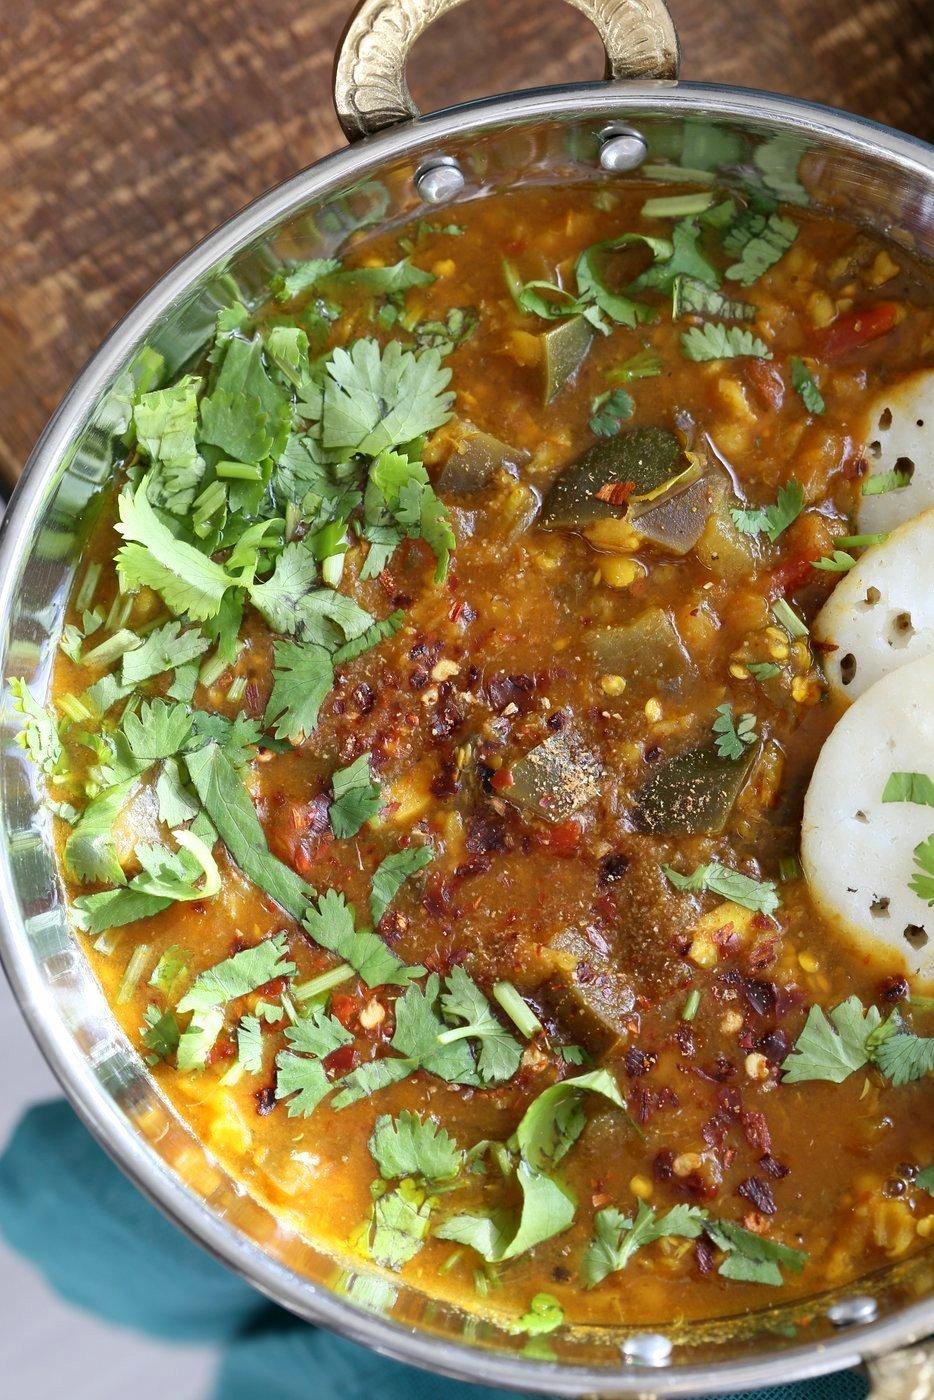 Eggplant Sambar Recipe - Indian Yellow Lentil Tamarind Dal. Toor Dal Sambar with Eggplant or other seasonal veggies. Instant Pot or Saucepan Vegan Gluten-free Soy-free Nut-free Recipe   VeganRicha.com